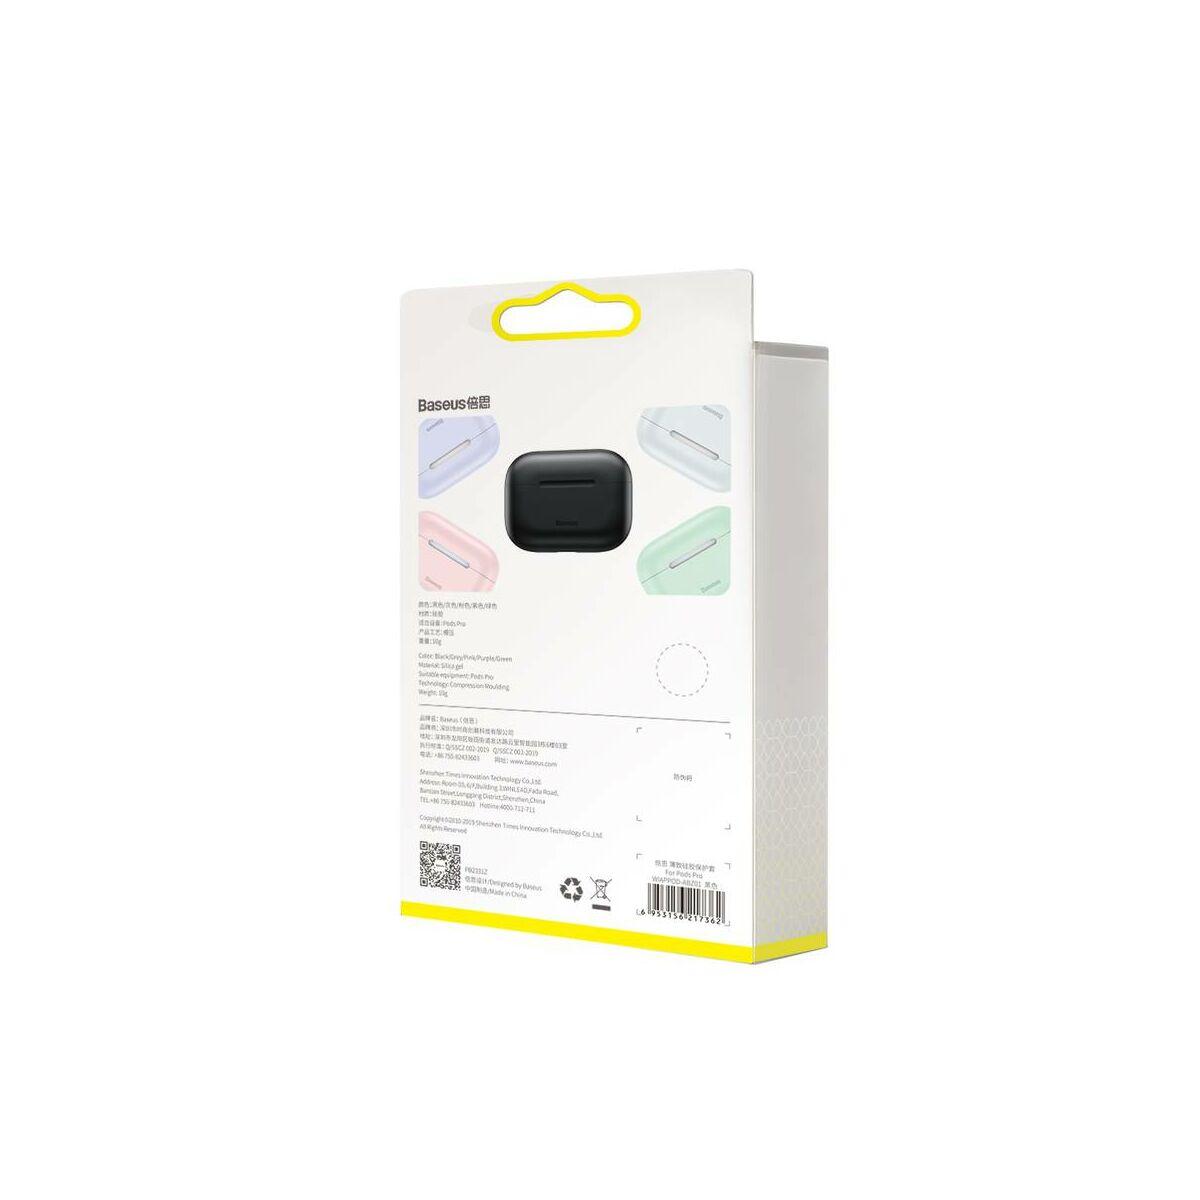 Baseus Airpods Pro tok, Super Thin szilikon, szuper vékony anyagból, fekete (WIAPPOD-ABZ01)